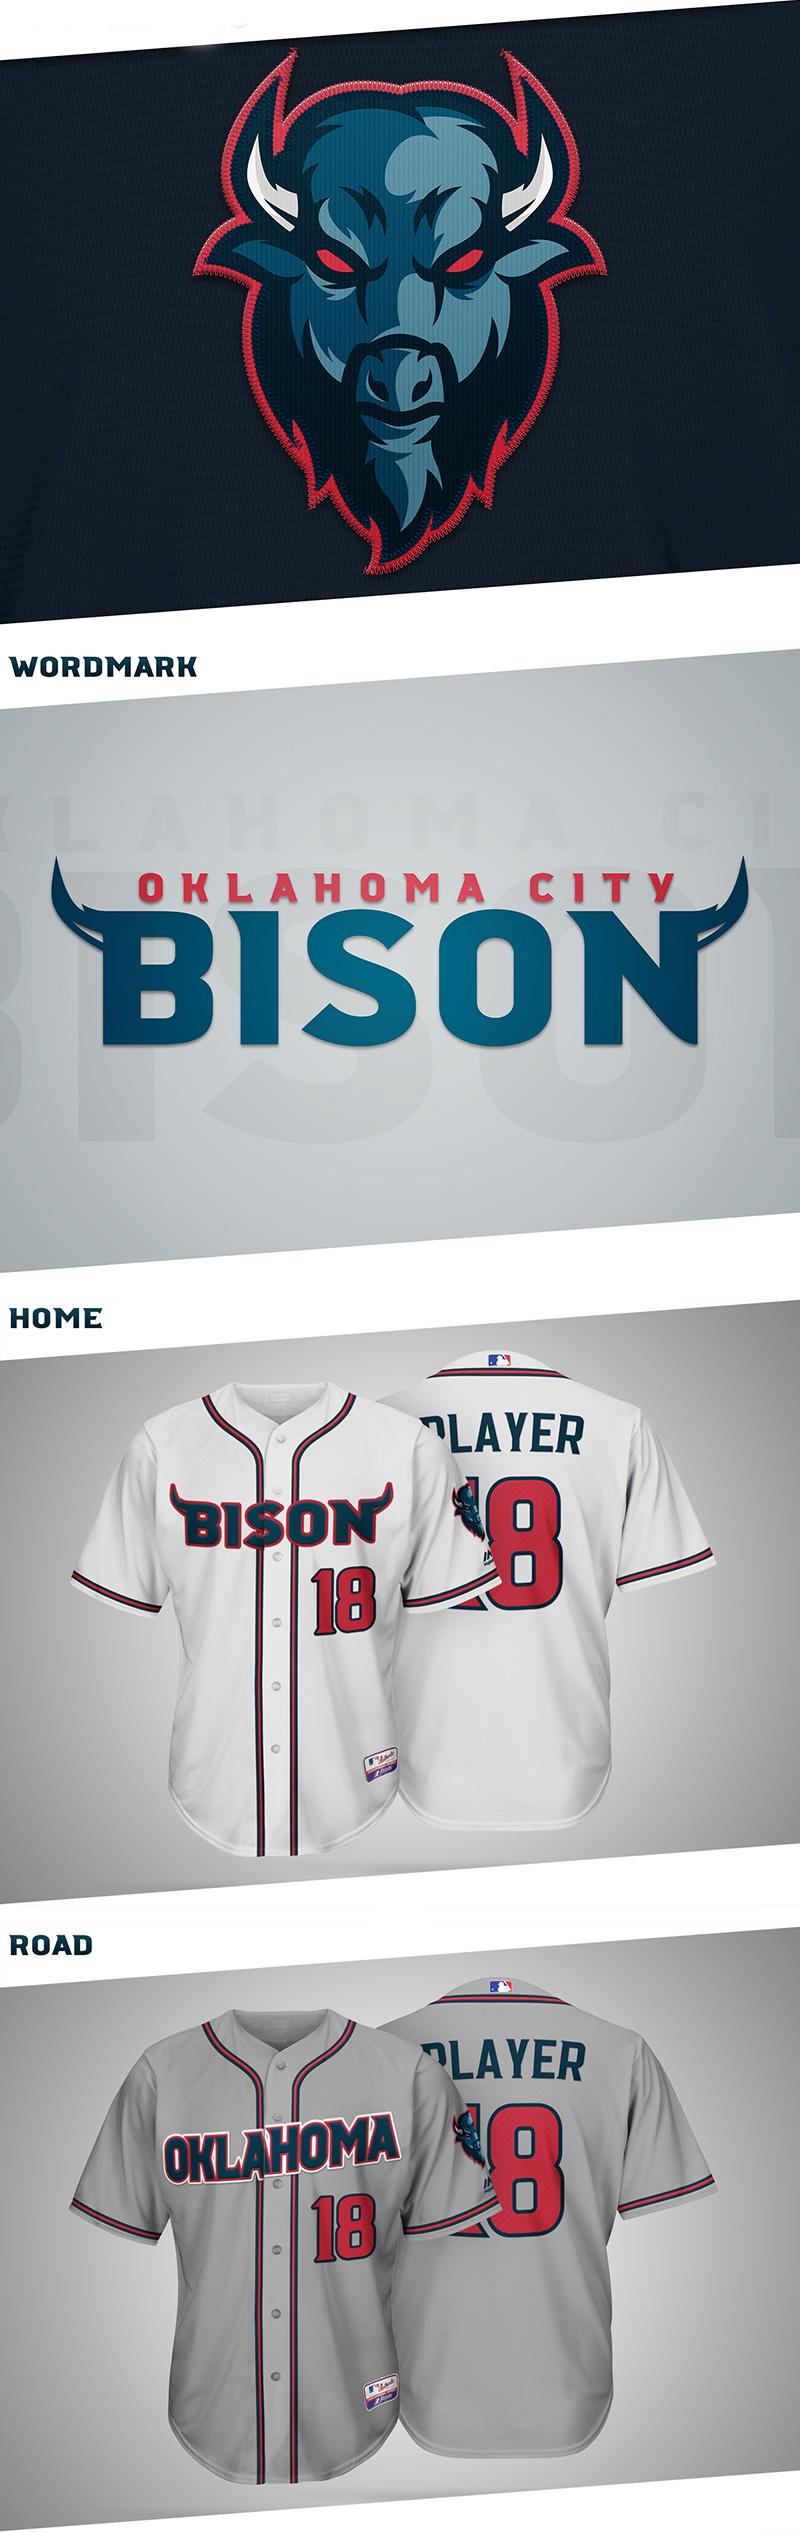 OKC Bison- MLB Expansion Team Concept by Ryan Lane